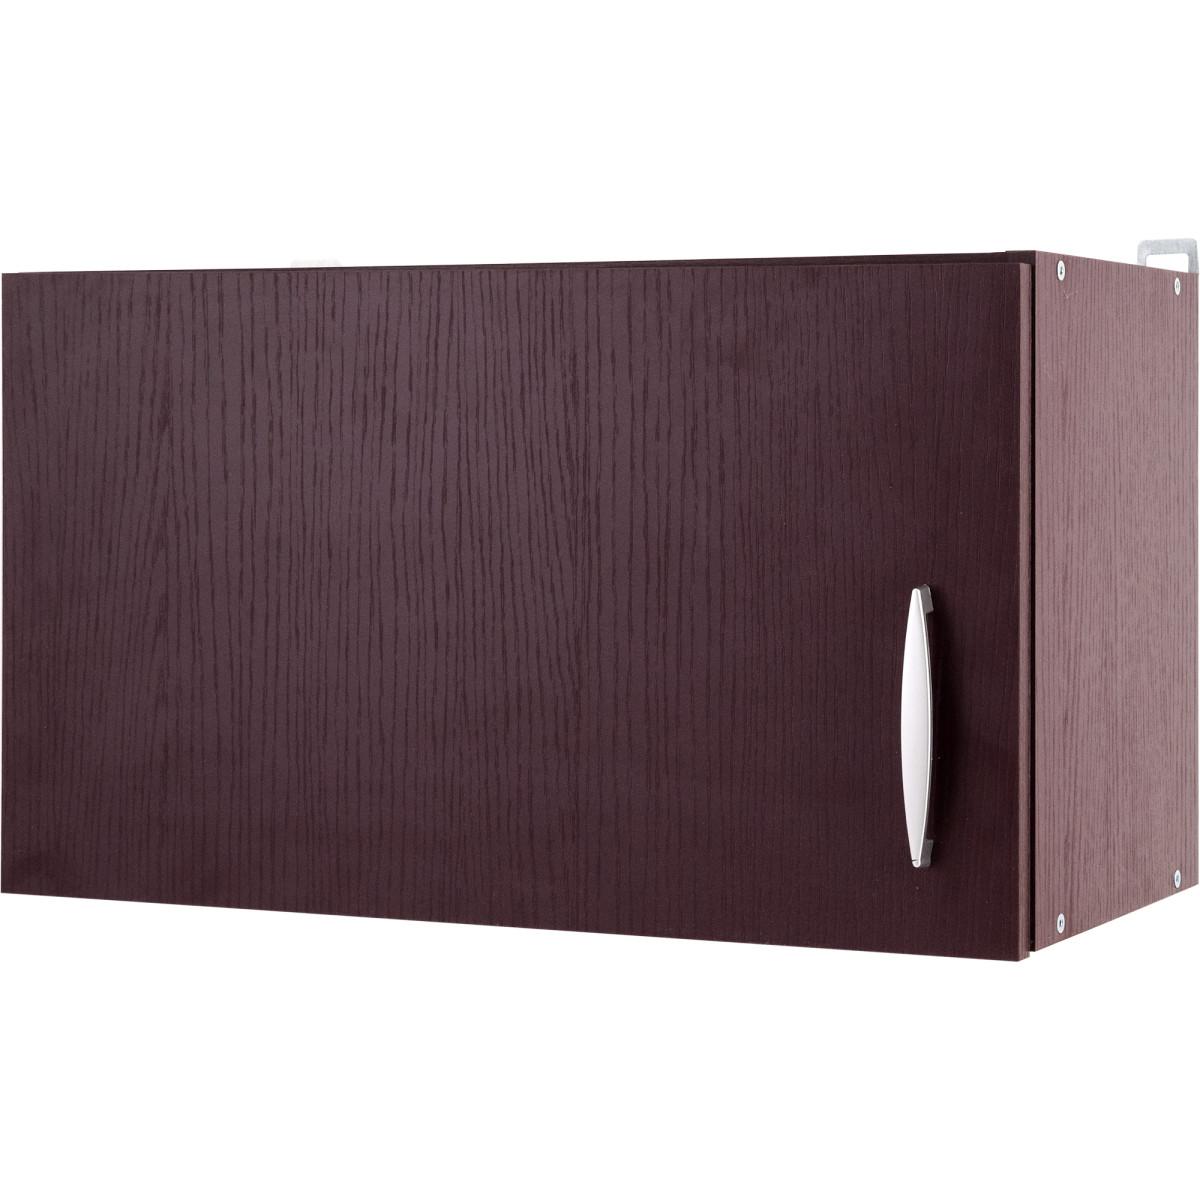 Шкаф навесной под вытяжку Бургун 60x35х29 см ЛДСП цвет бургун